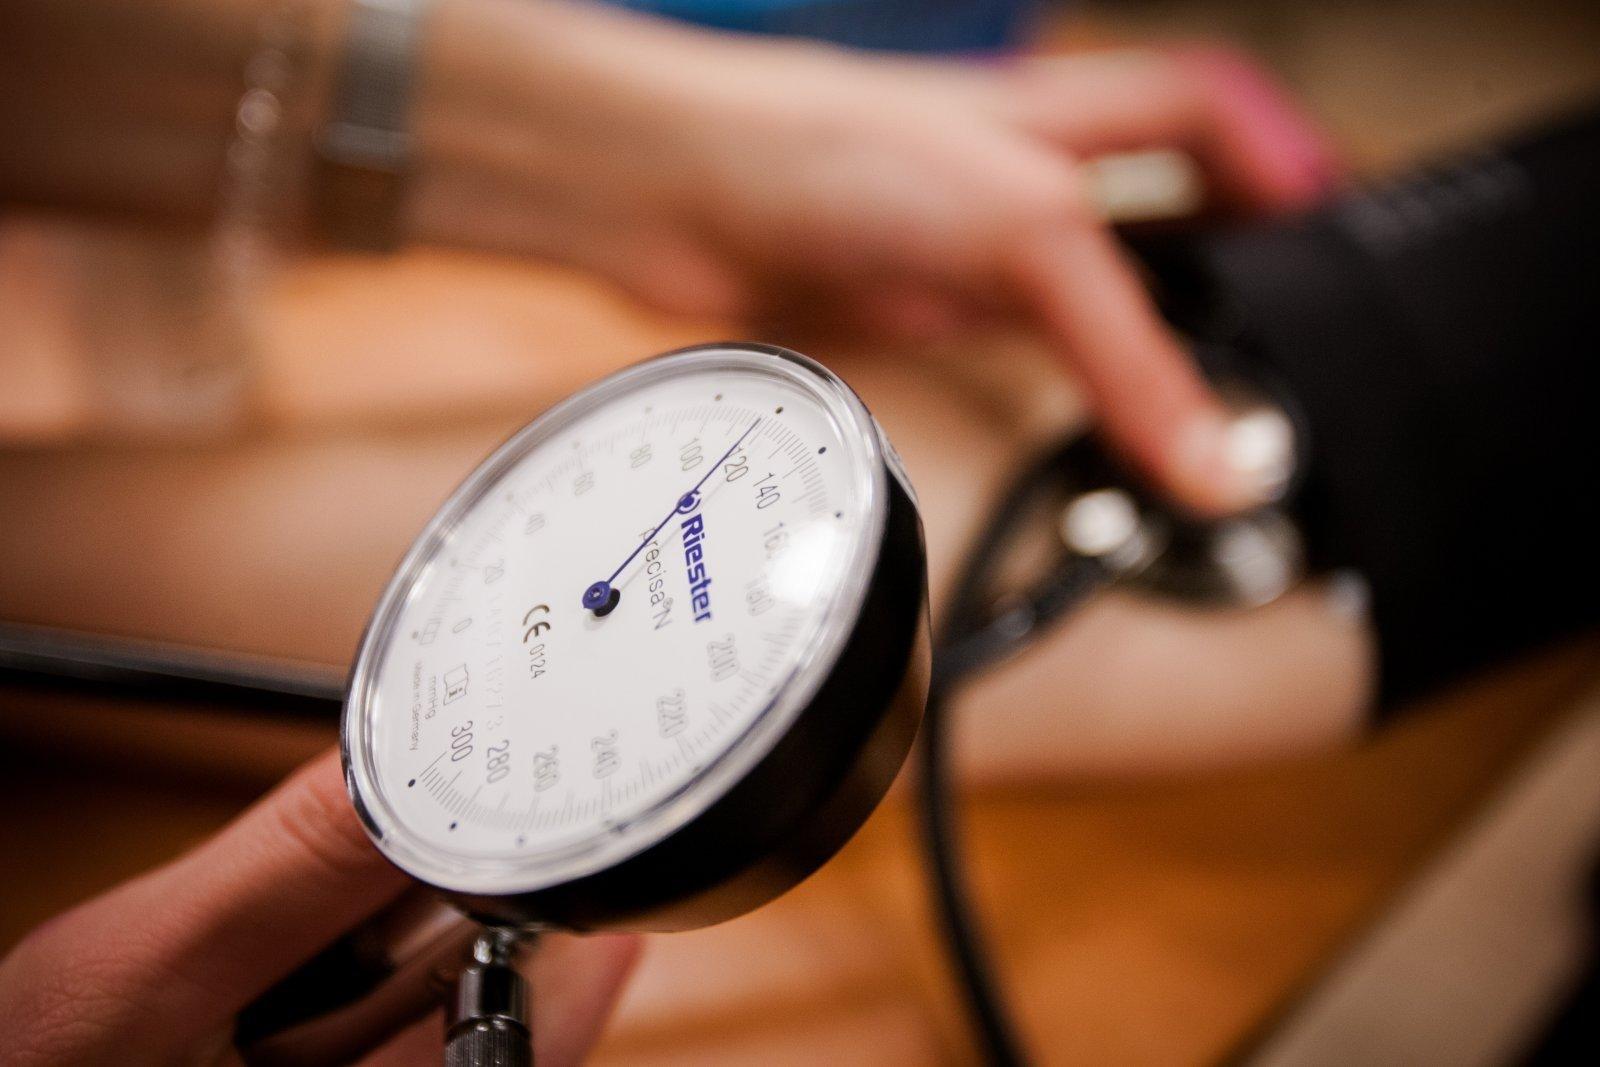 hipertenzija ir kraujo krešuliai)